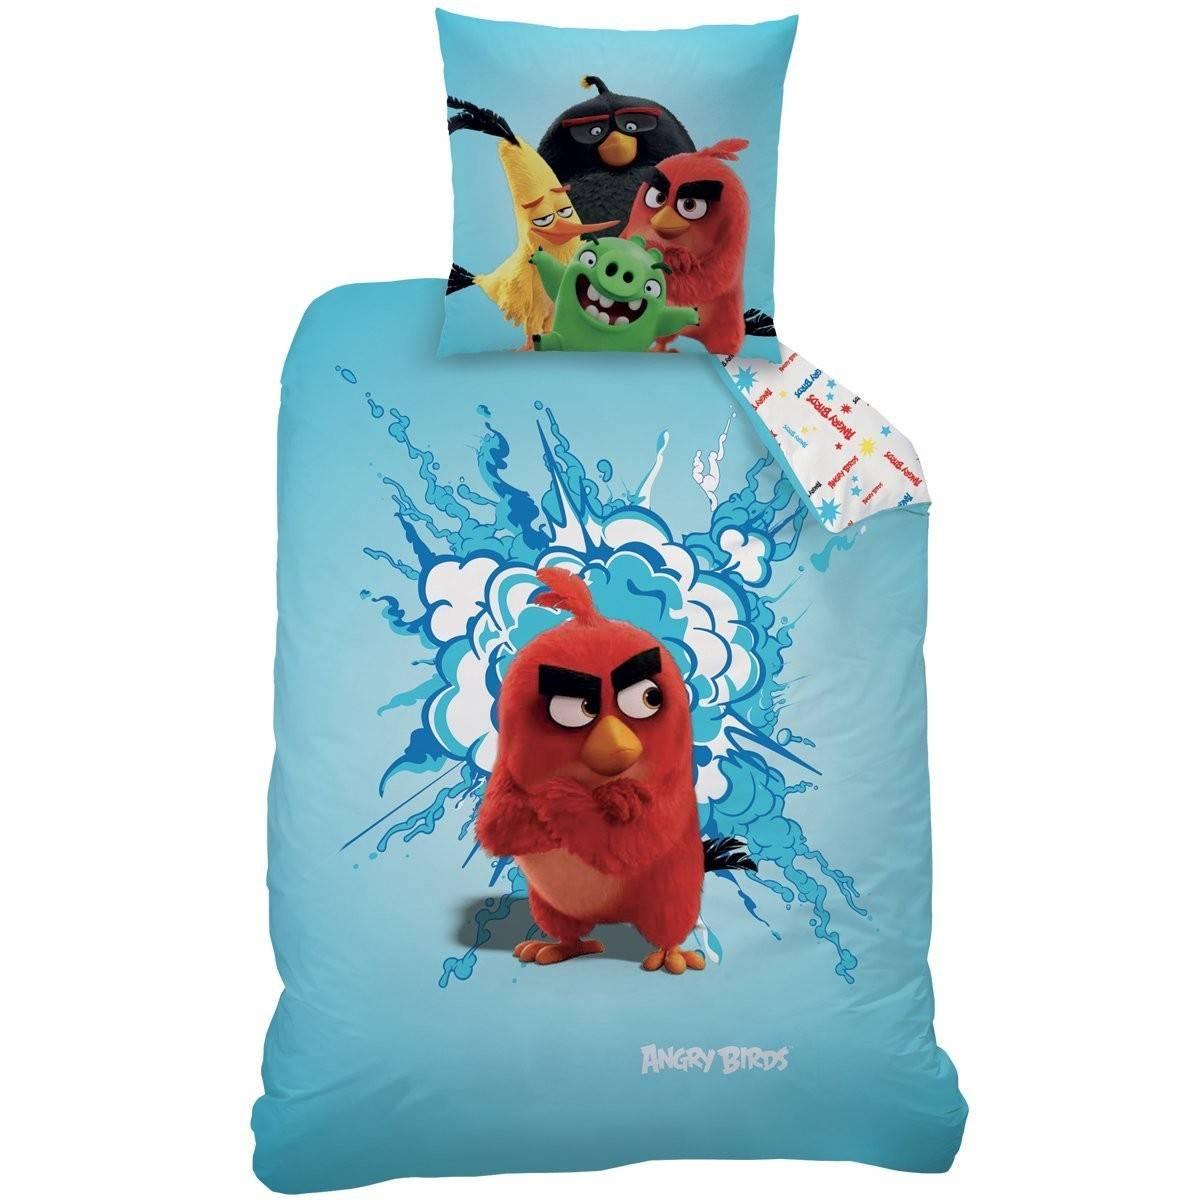 Angry Birds - Housse de Couette 140 x 200 cm + Taie d'Oreiller 63 x 63 cm - Bleu